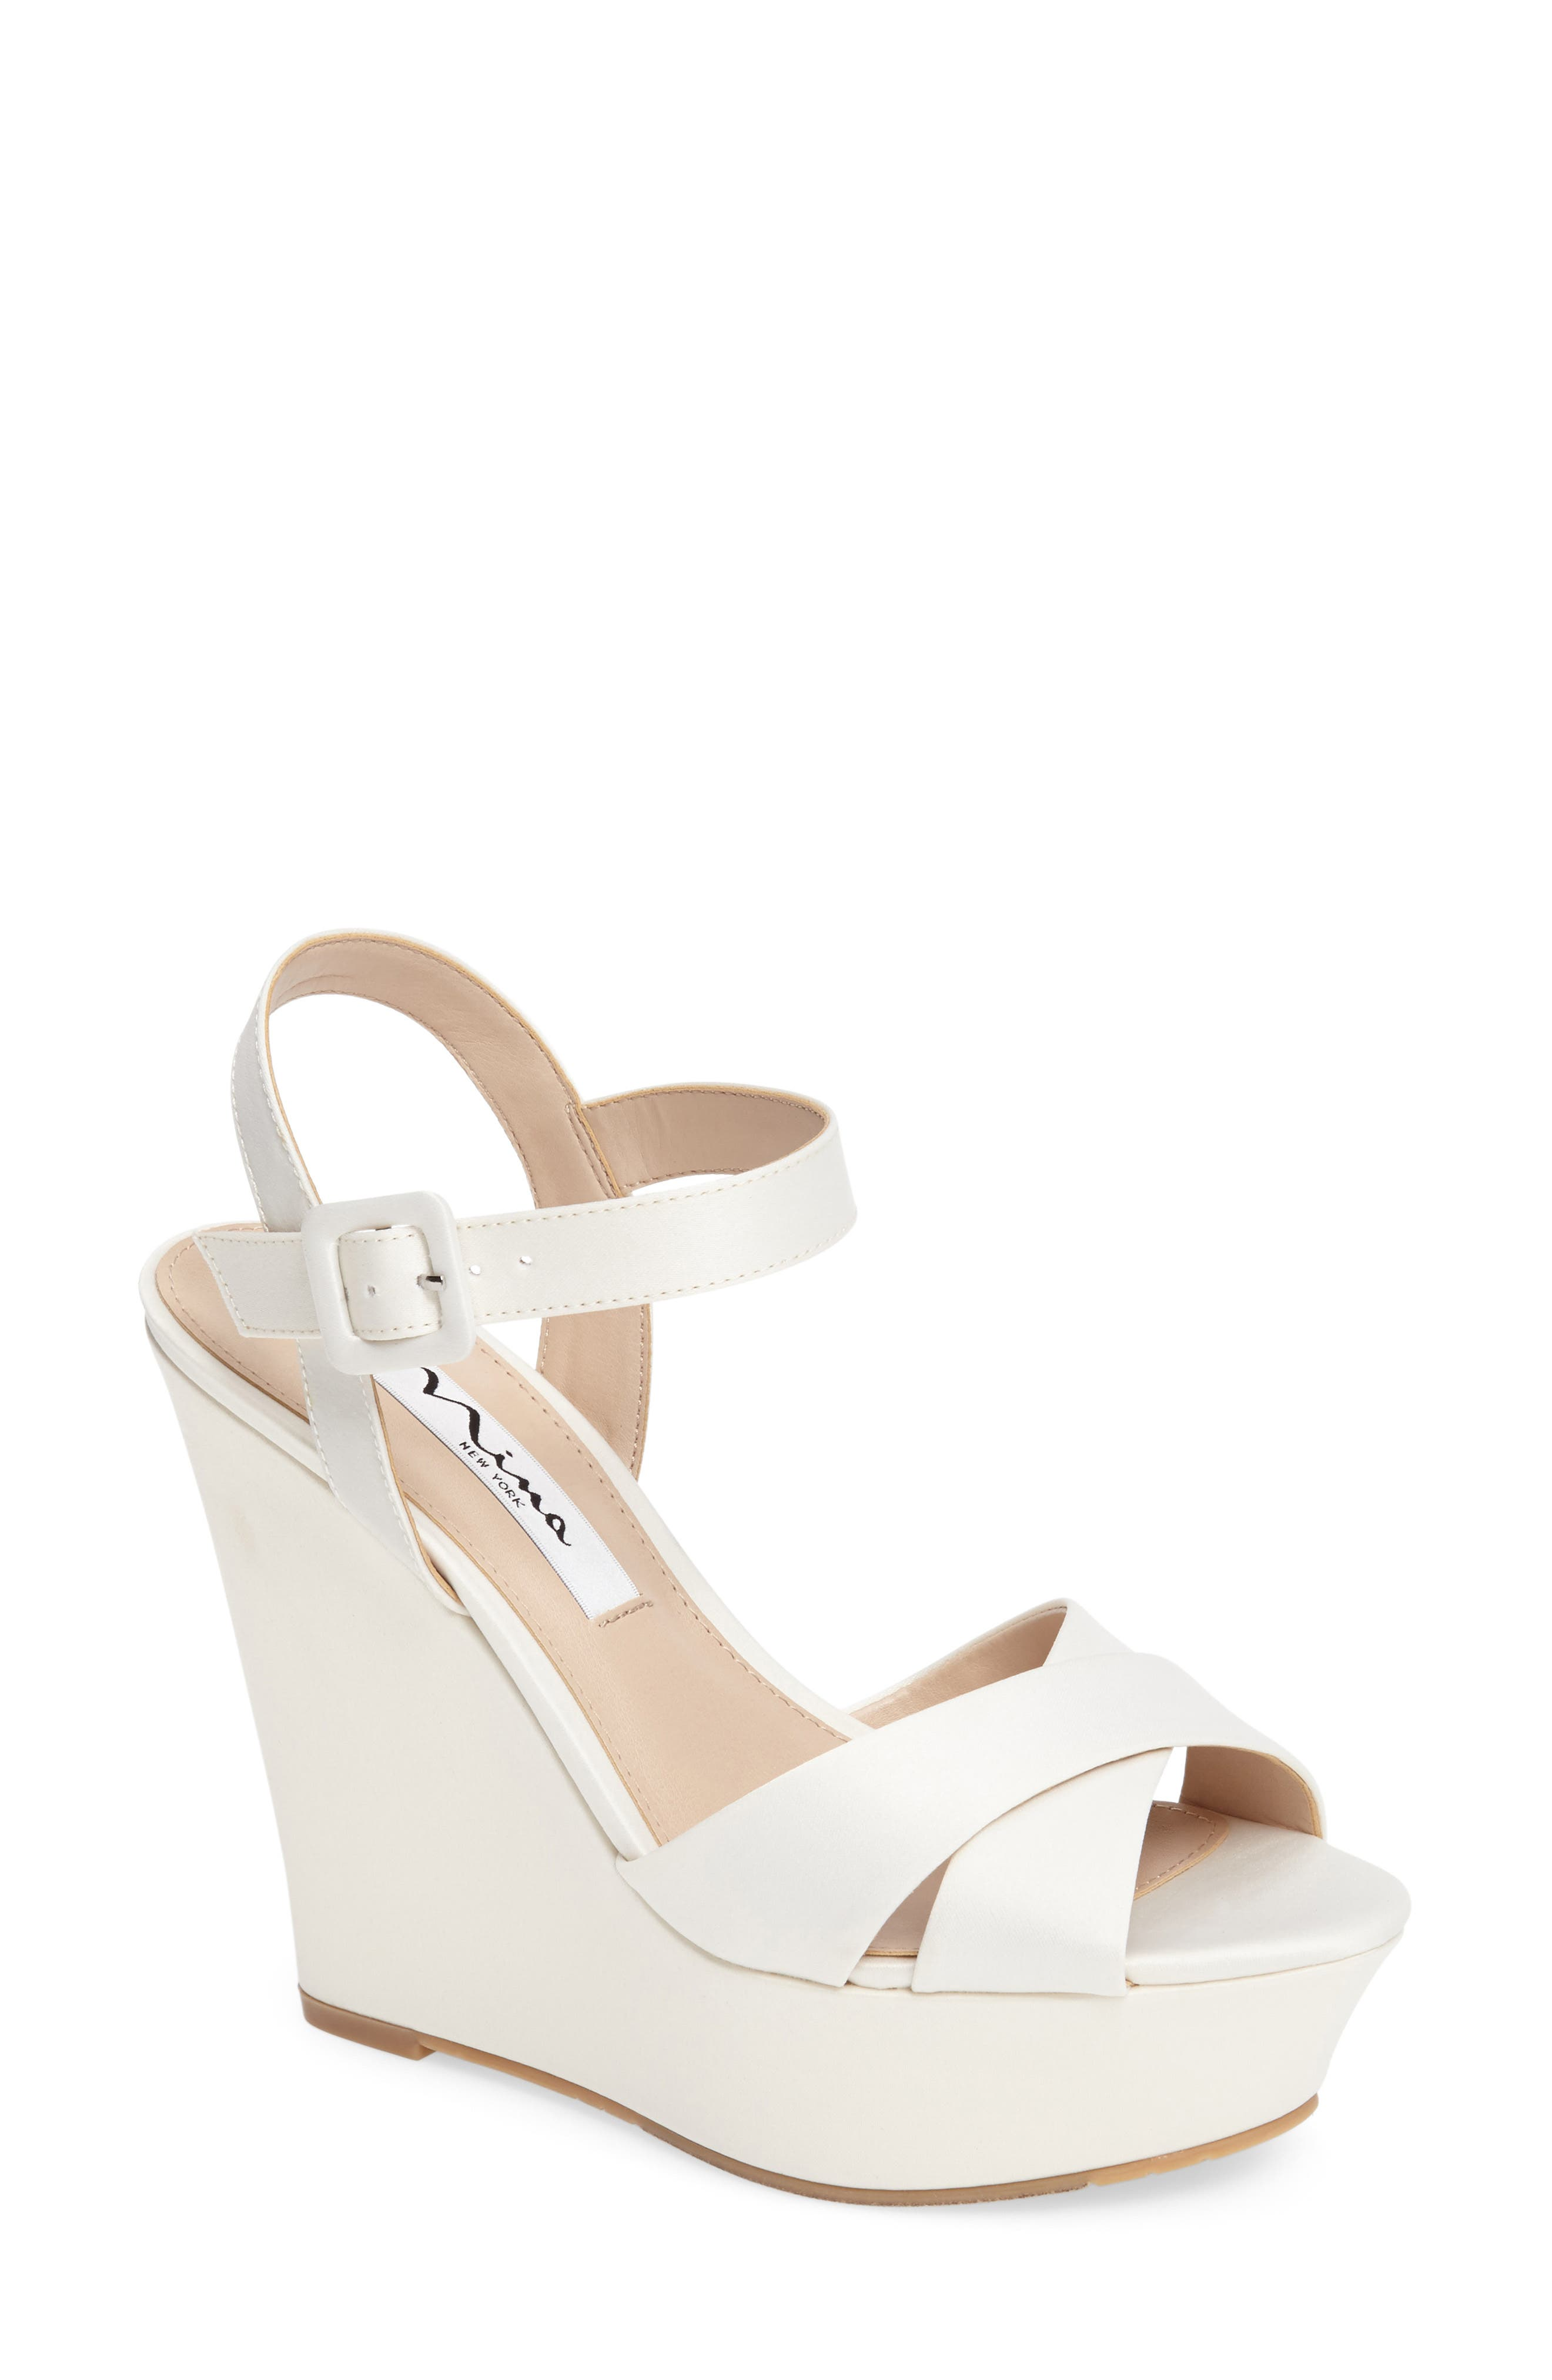 Alternate Image 1 Selected - Nina Jinjer Platform Wedge Sandal (Women)